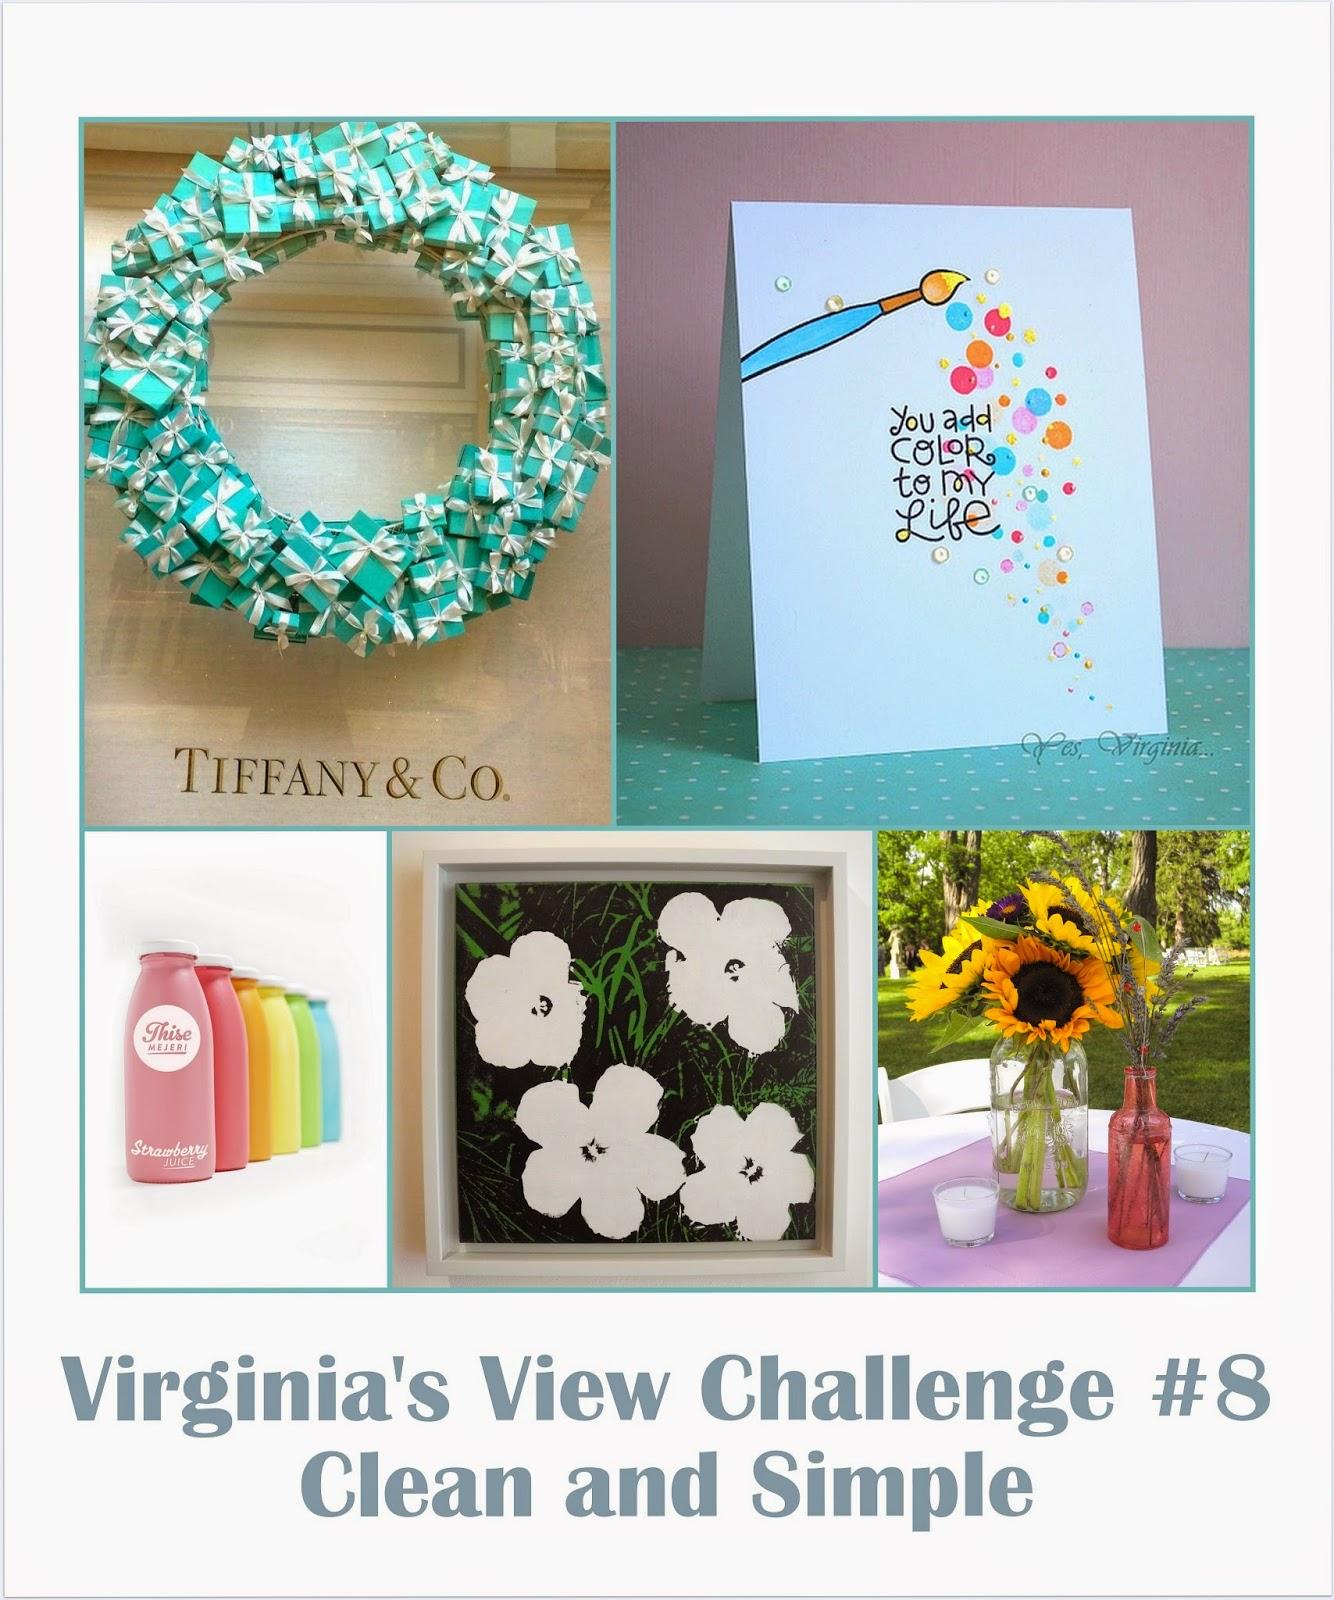 http://virginiasviewchallenge.blogspot.ie/2014/10/virginias-view-challenge-8.html